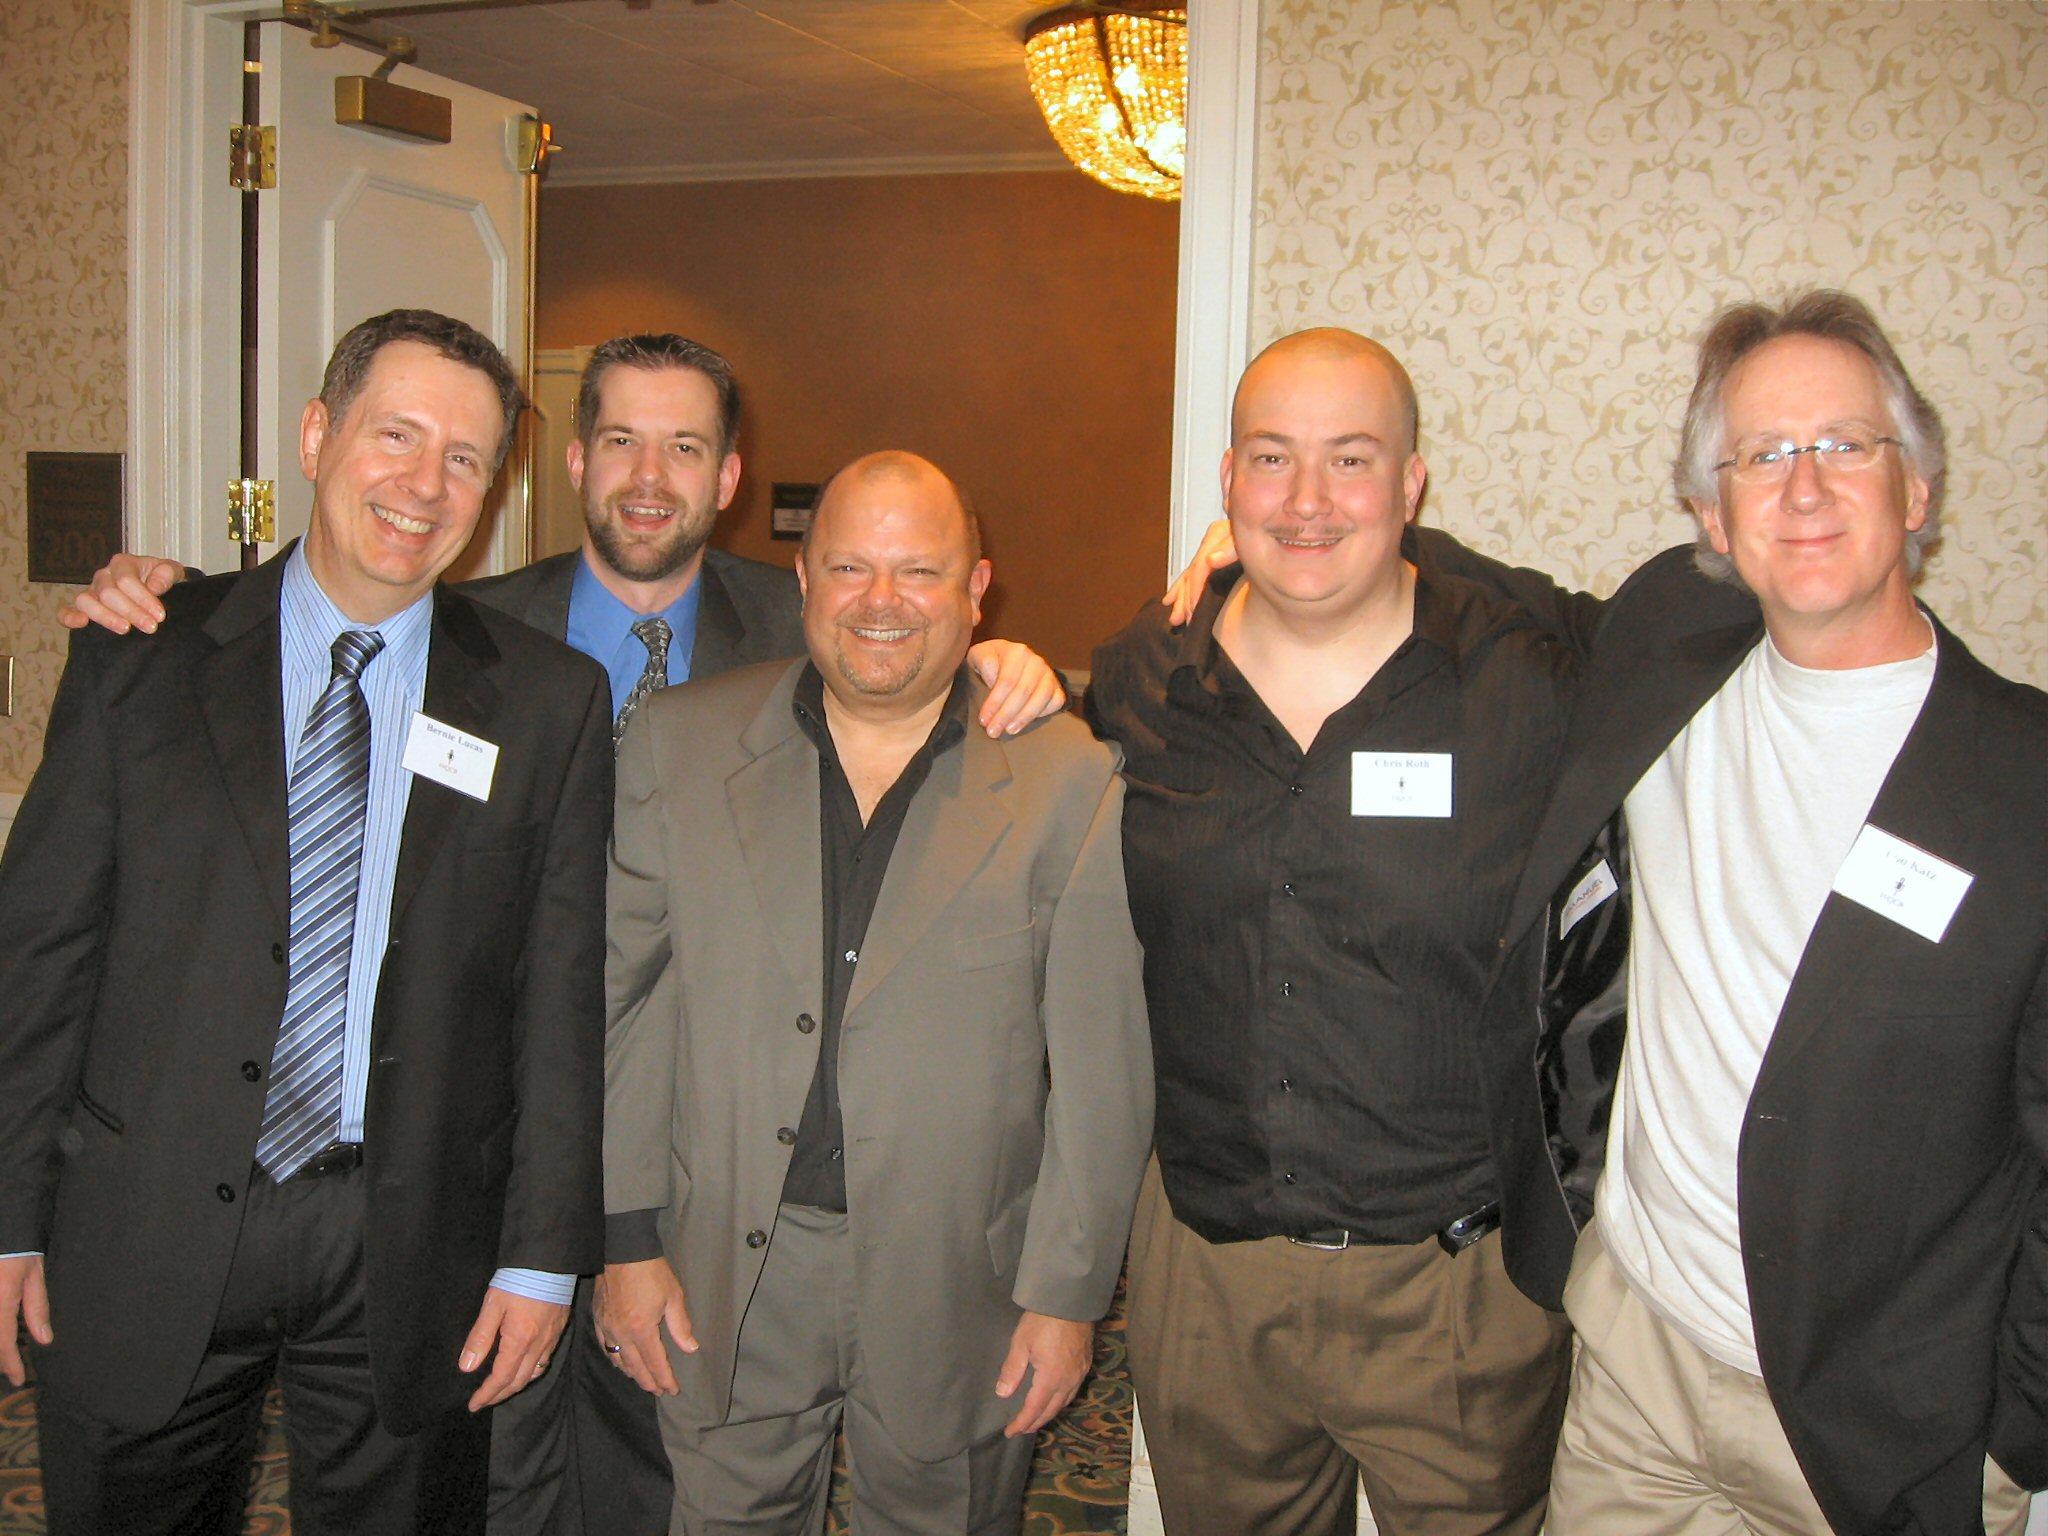 Bernie Lucas, me, Ed Rodriguez, Chris Roth and Loo Katz at the WQCB (Washington Quarter Century Broadcasters) dinner.